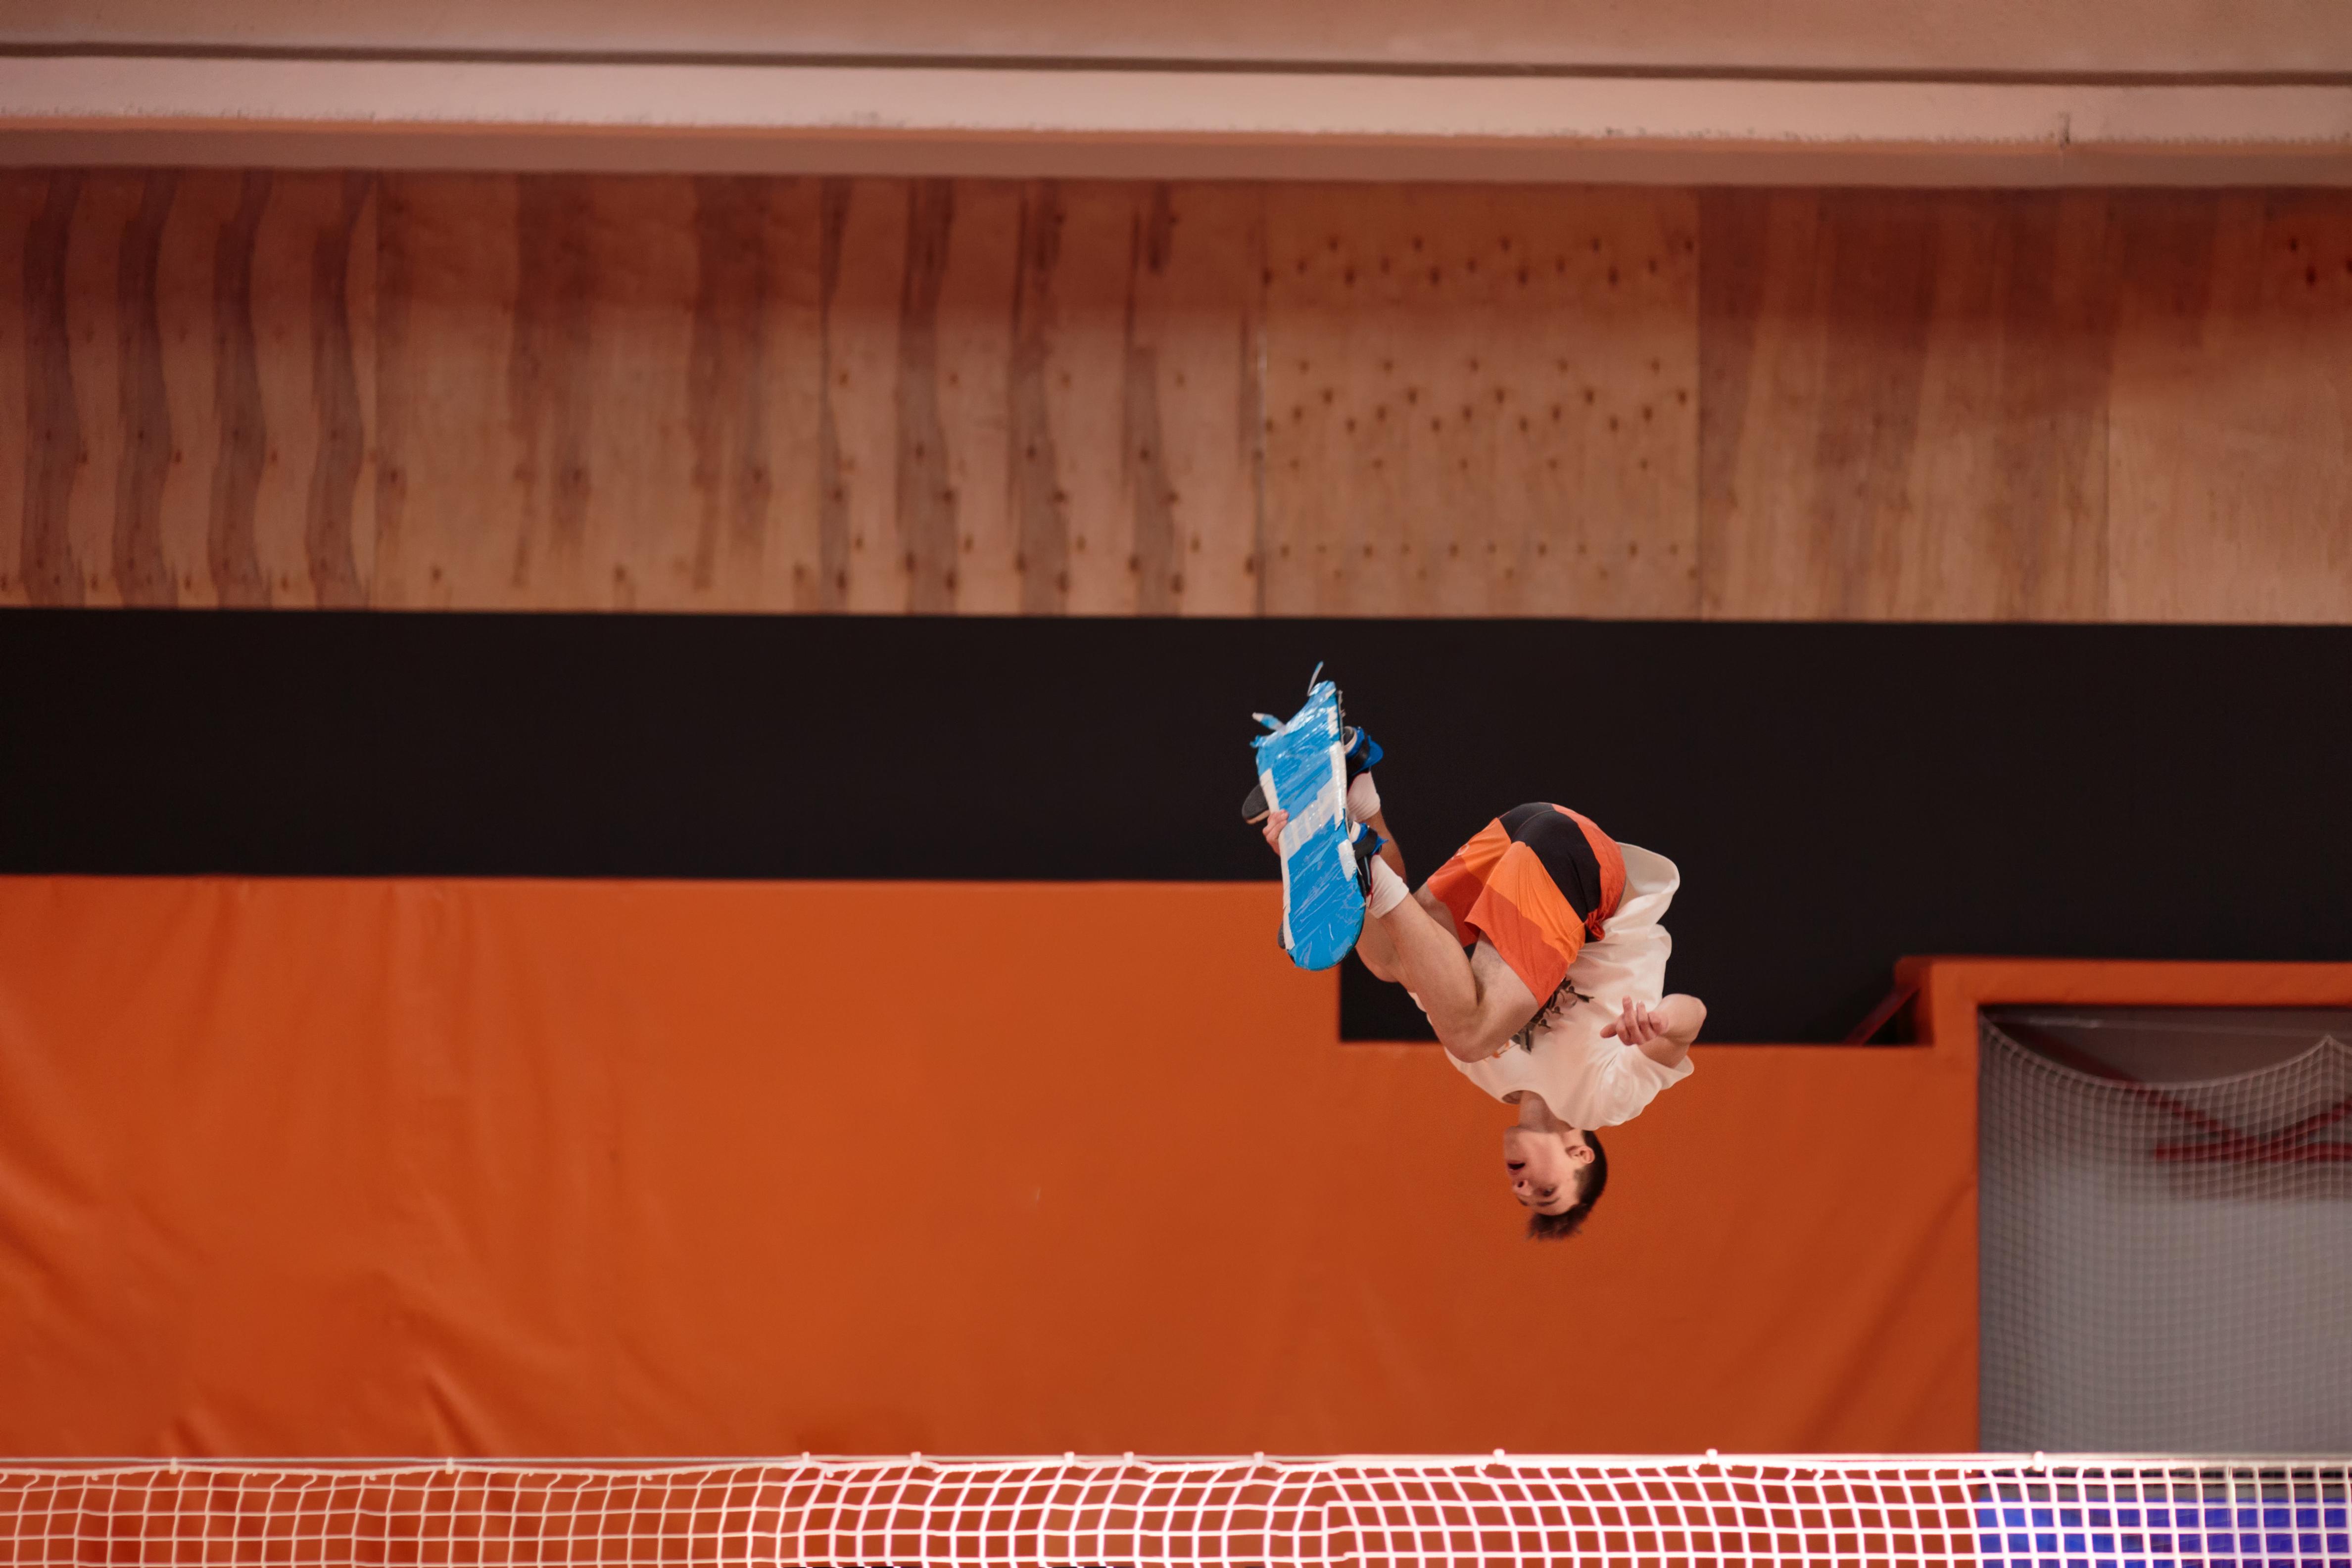 Planche freestyle trampoline